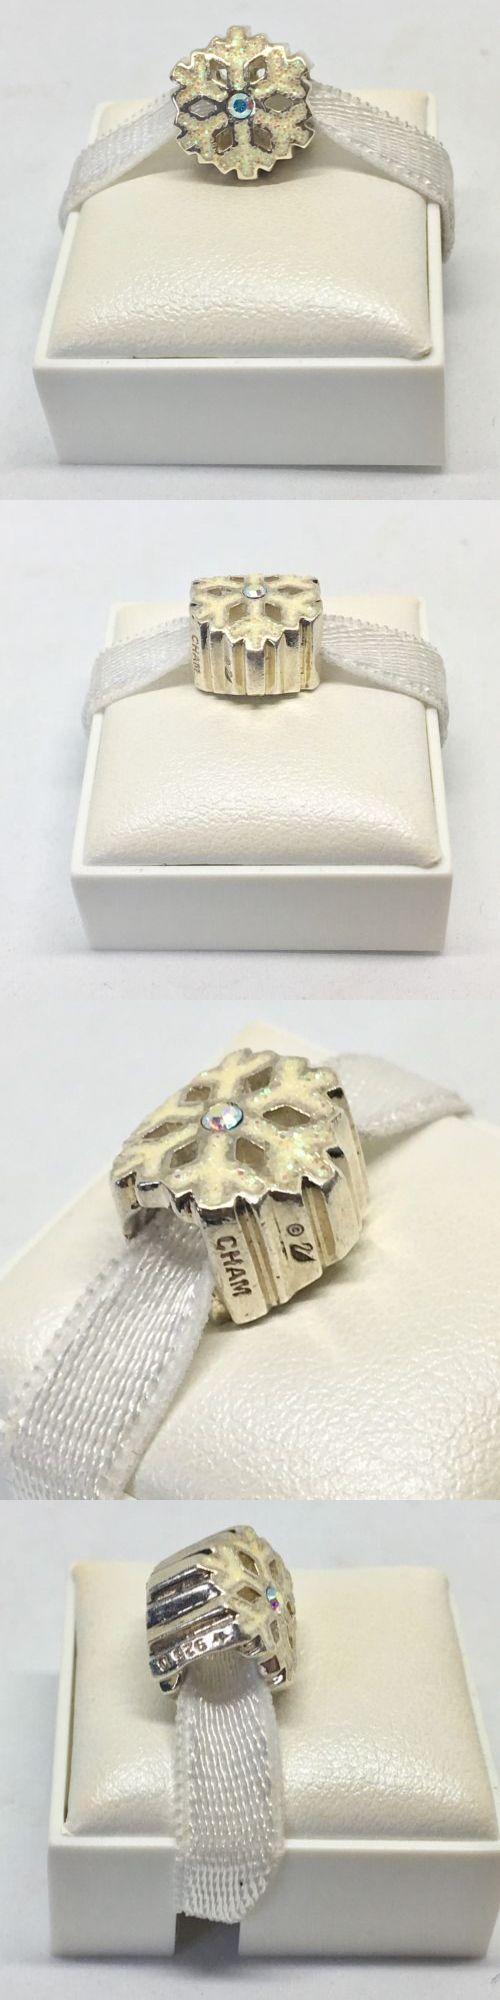 Fine Charms and Charm Bracelets 140956: Rare Chamilia Swarovski Snowflake Charm Silver -> BUY IT NOW ONLY: $38 on eBay!